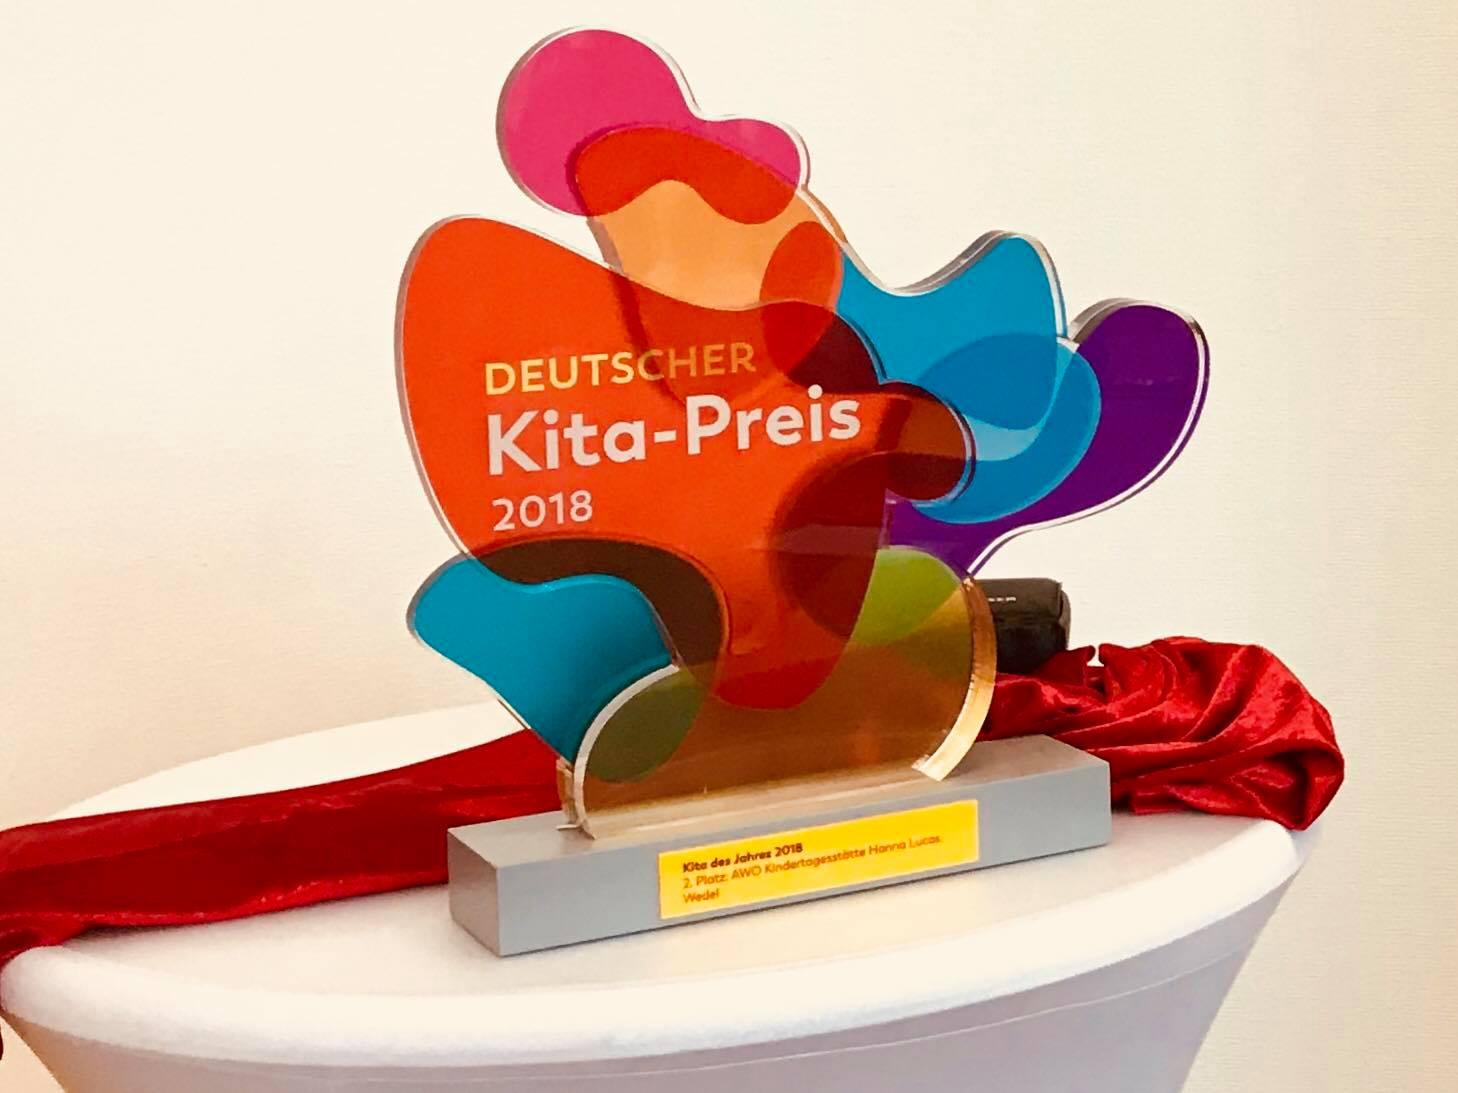 Nina Schilling FDP Wedel Deutscher Kita Preis für AWO-Kita Hanna Lucas